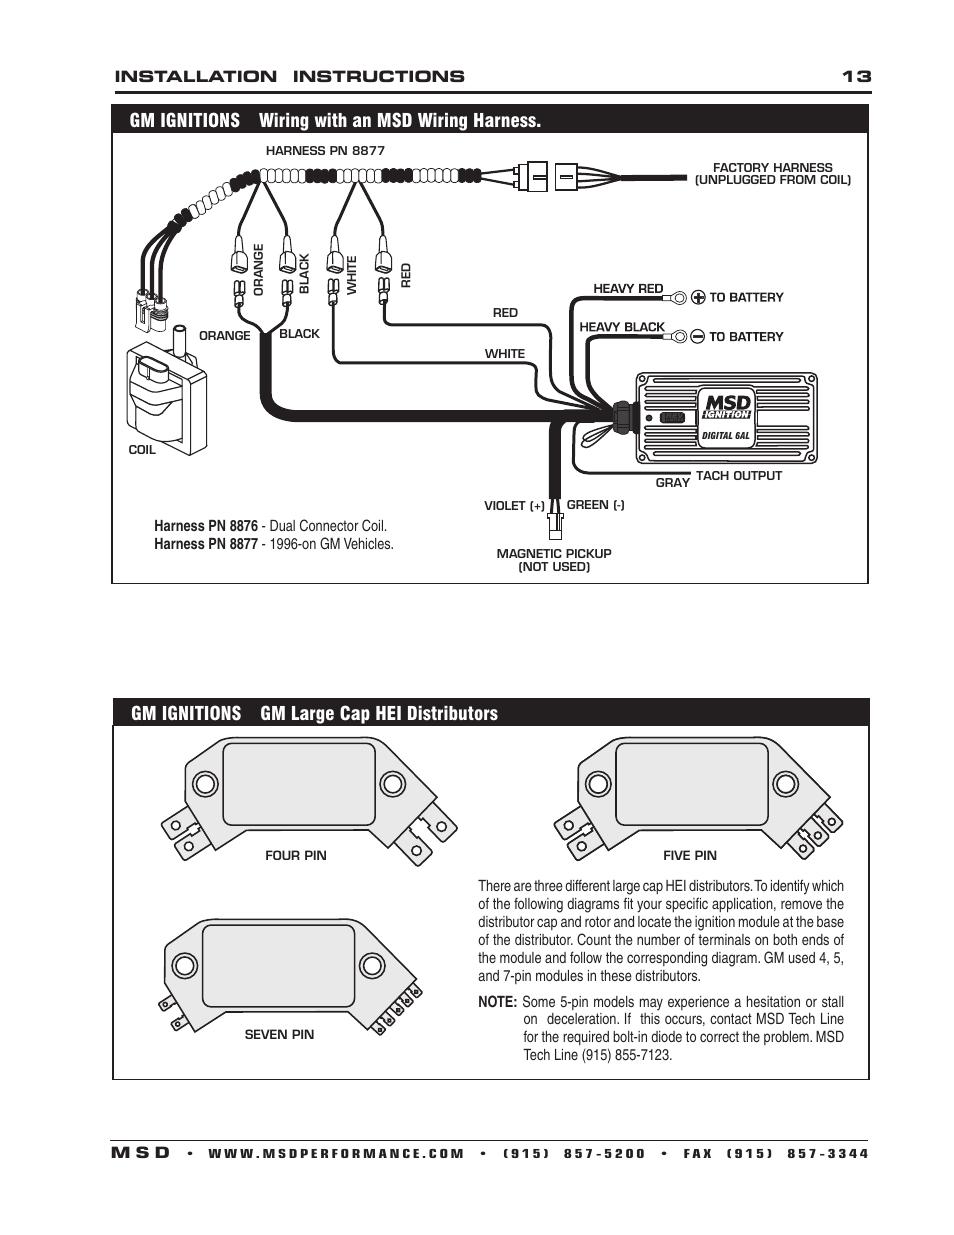 msd 6201 digital 6a ignition control page13?resize\\\\\\\=665%2C861 hei msd 8680 wiring diagram msd digital 7 plus diagram, msd Simple Ignition Wiring Diagram at crackthecode.co